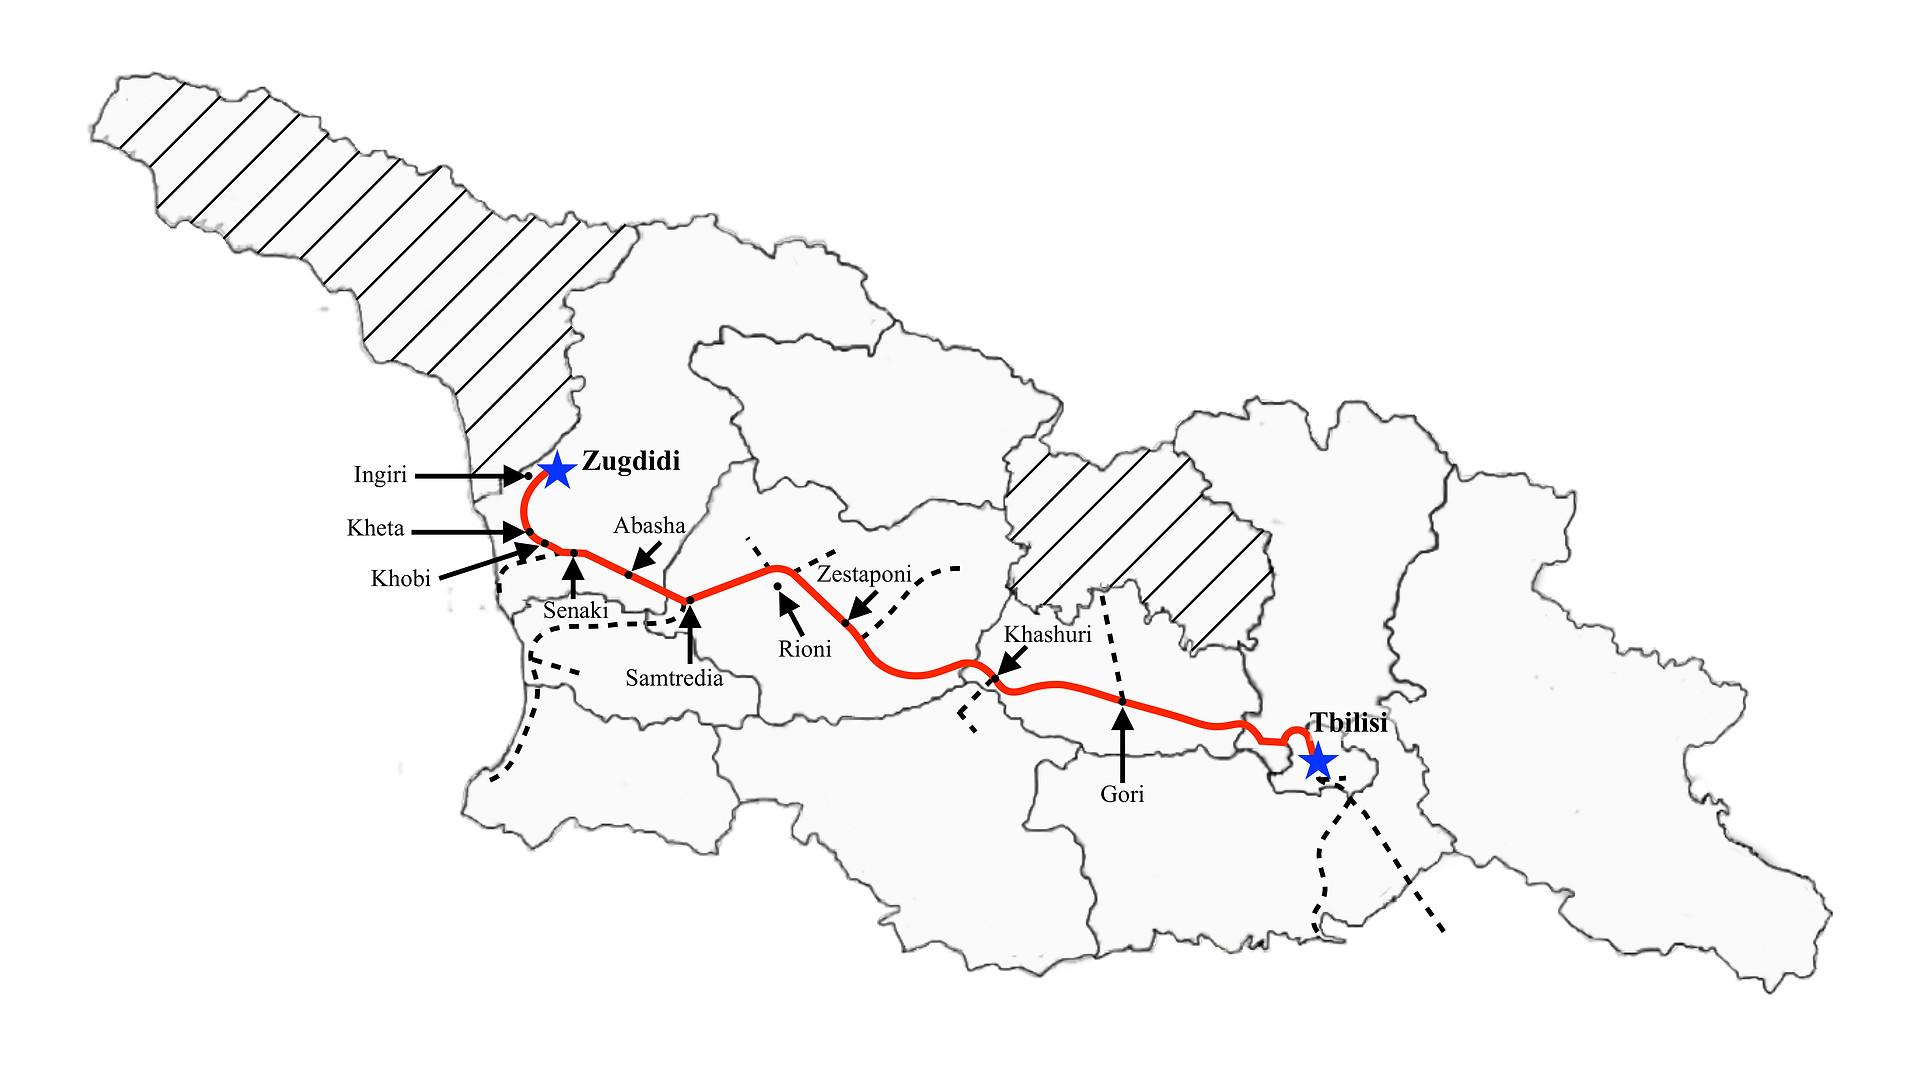 Zugdidi to Tbilisi (Fast)